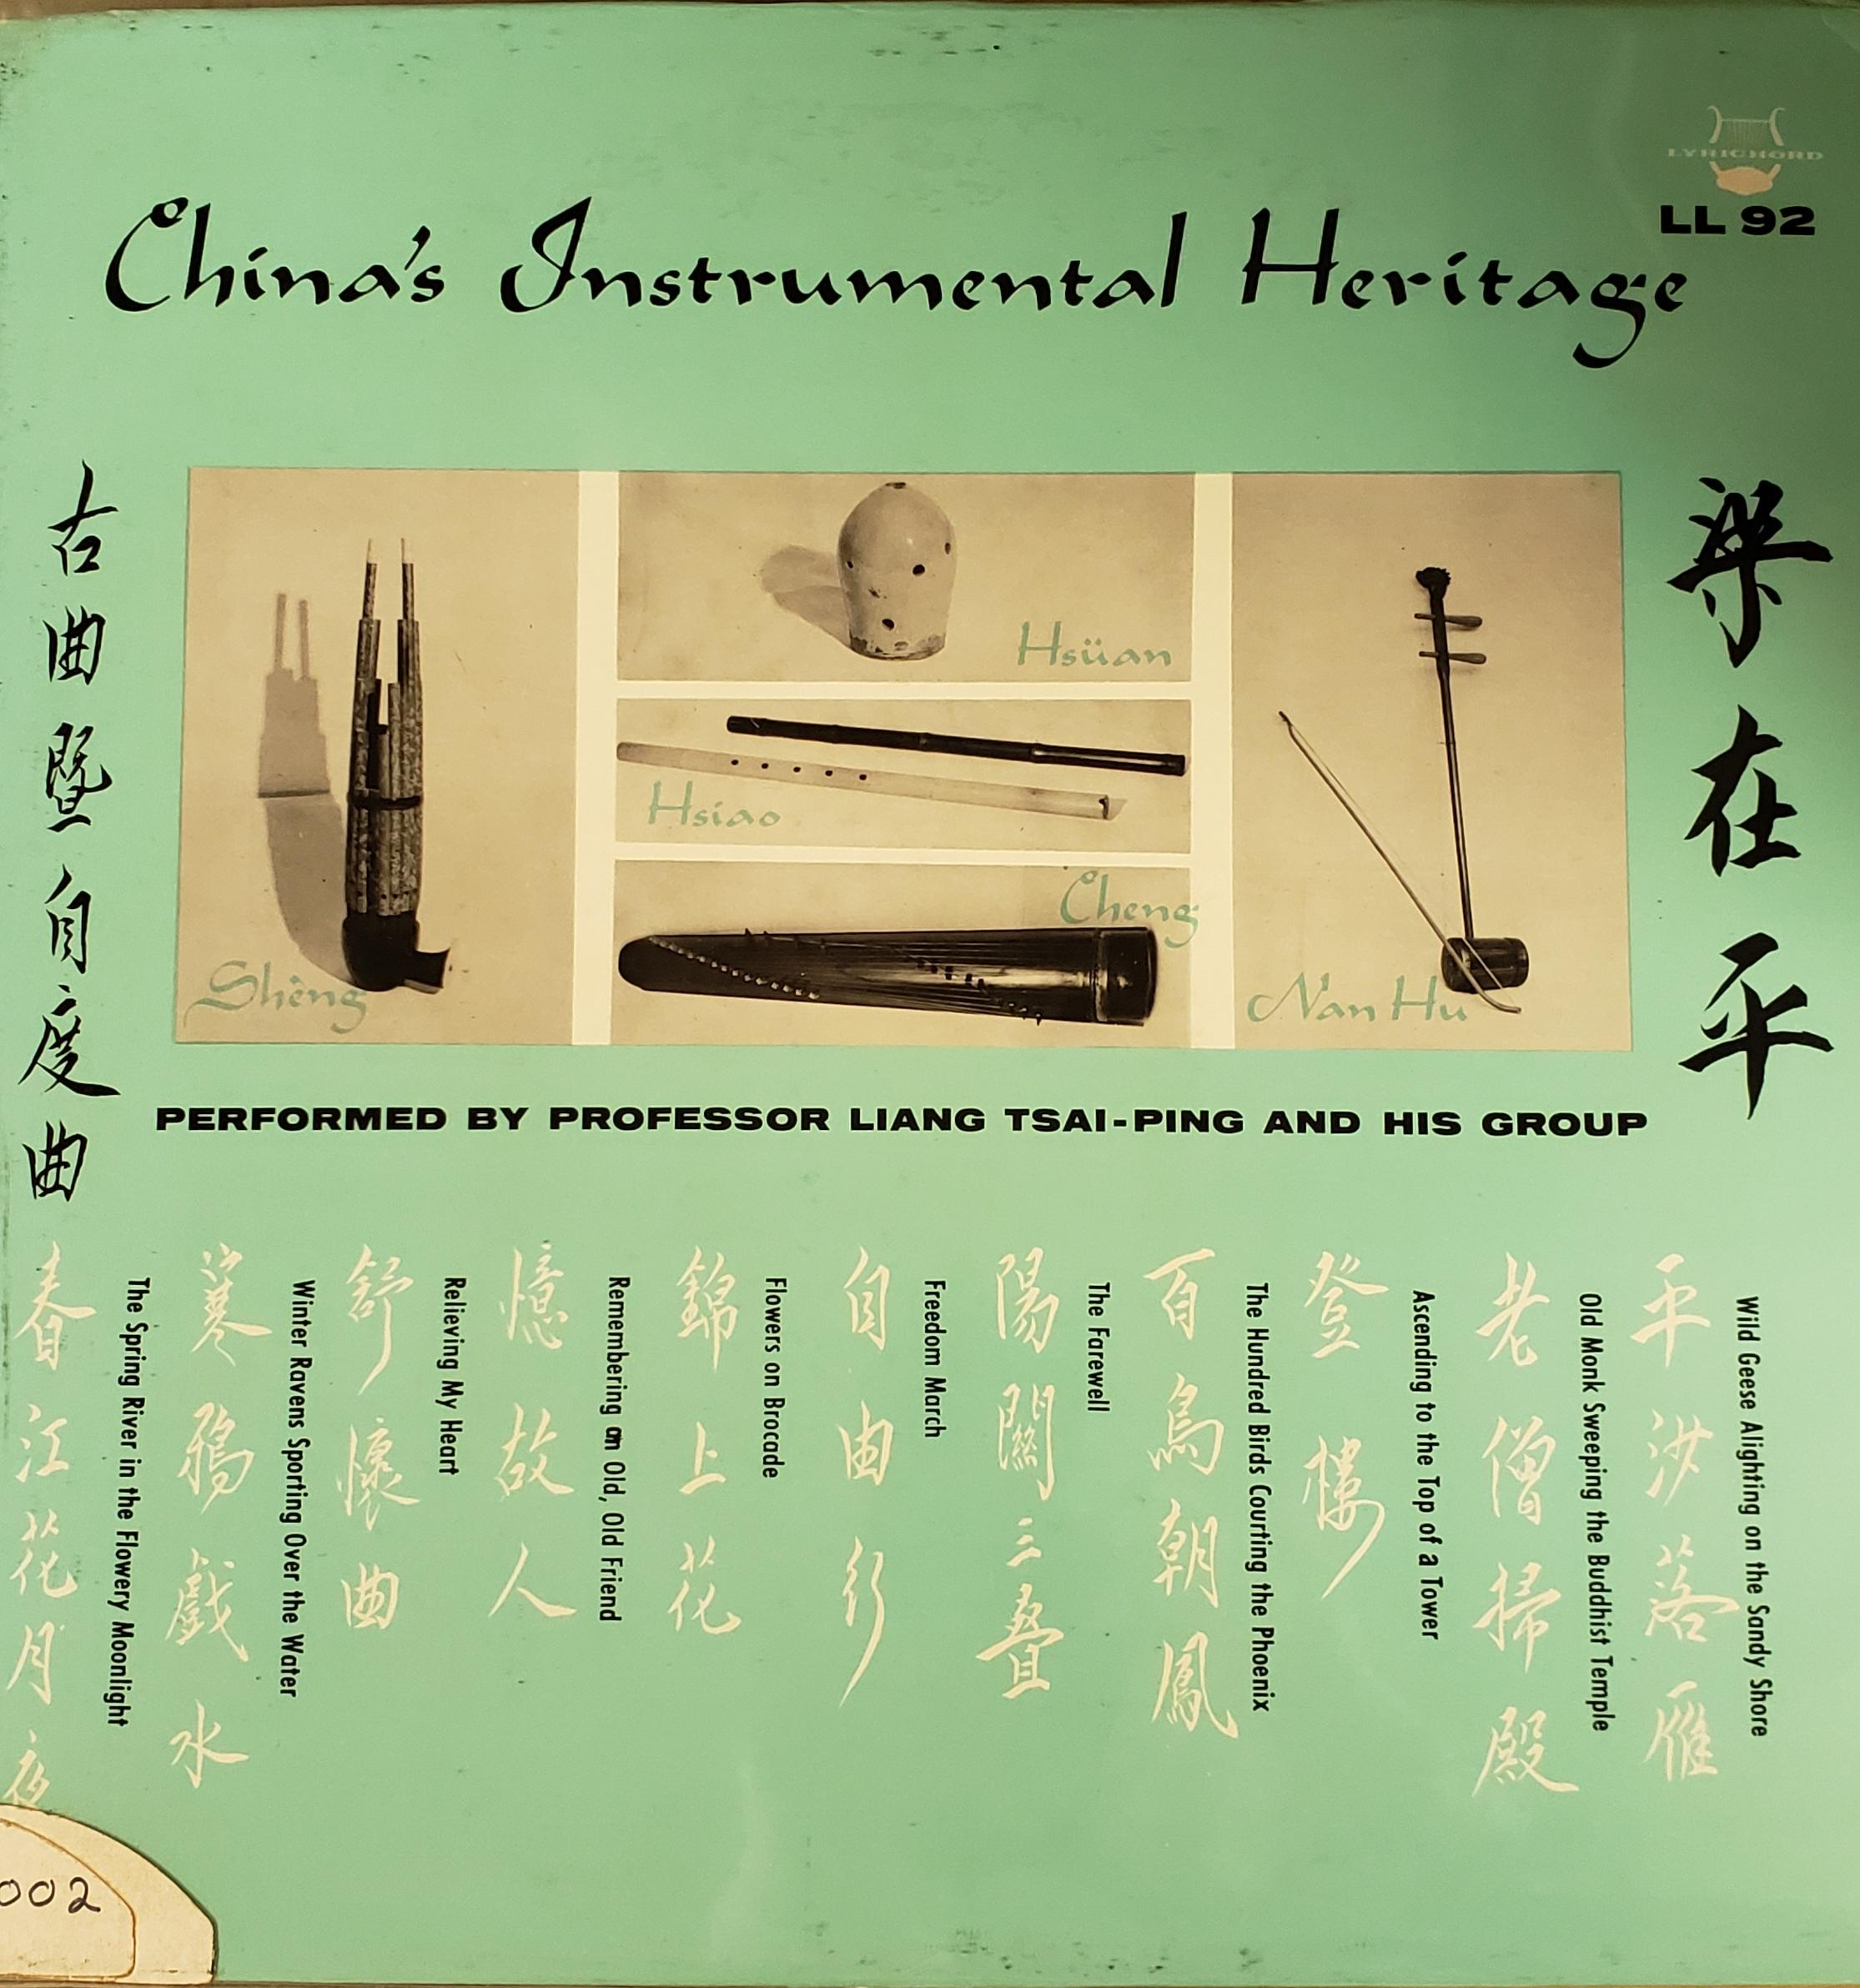 China's instrumental heritage 1960